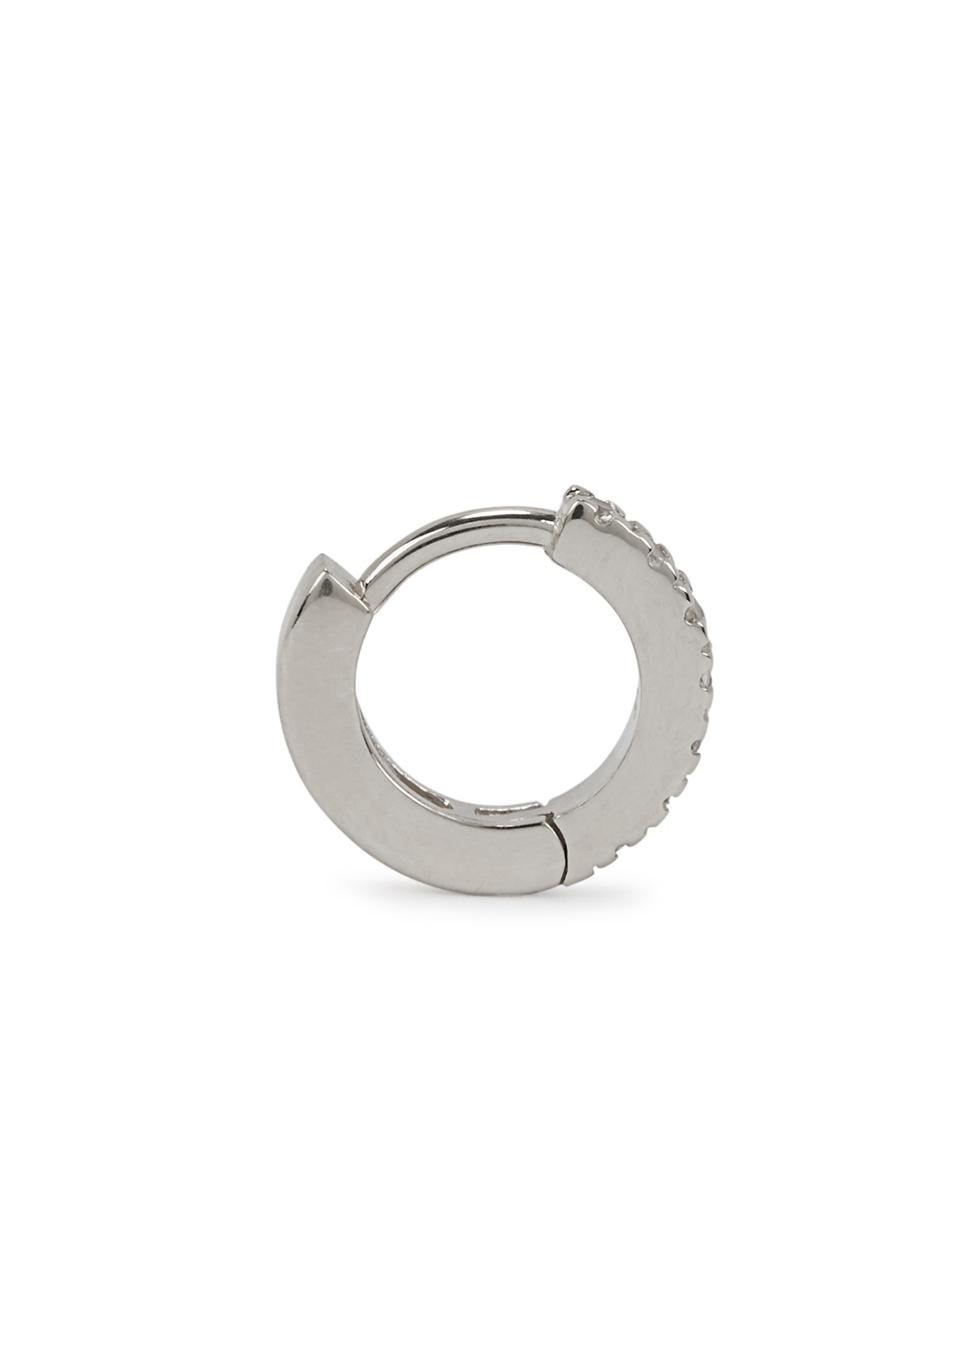 Huggie 9kt white gold hoop earring - OTIUMBERG